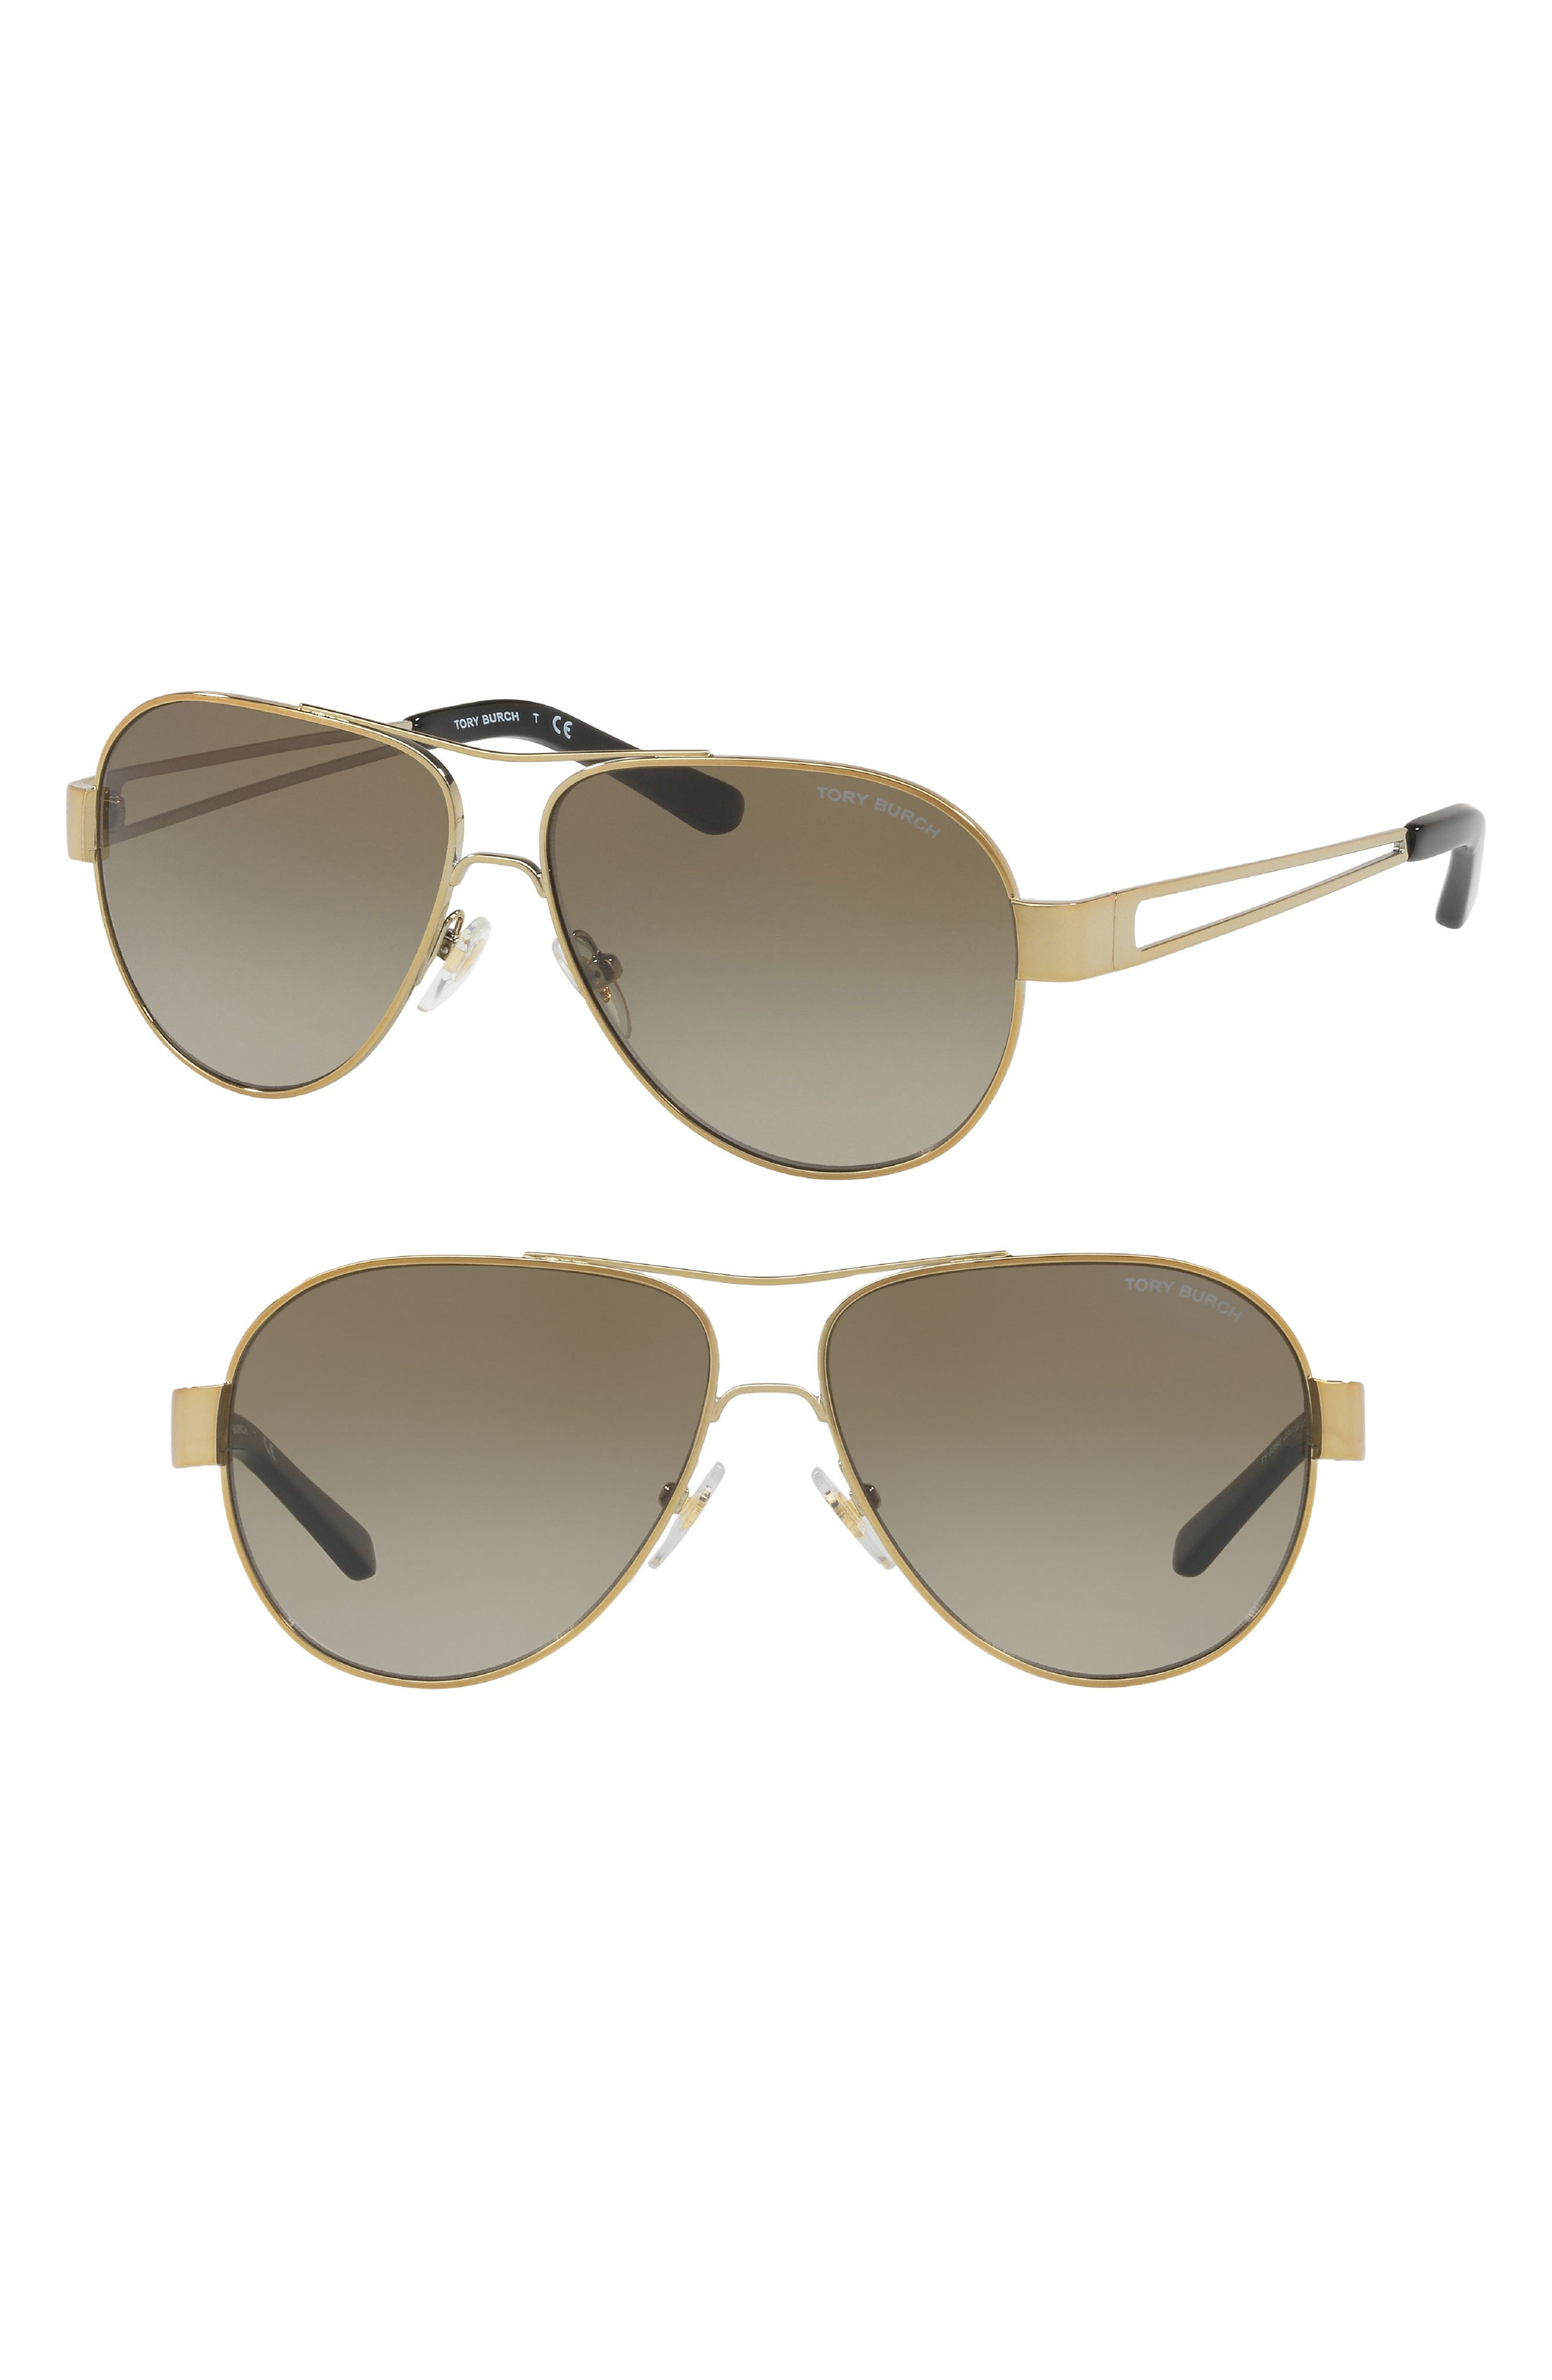 55mm Polarized Aviator Sunglasses,                             Main thumbnail 4, color,